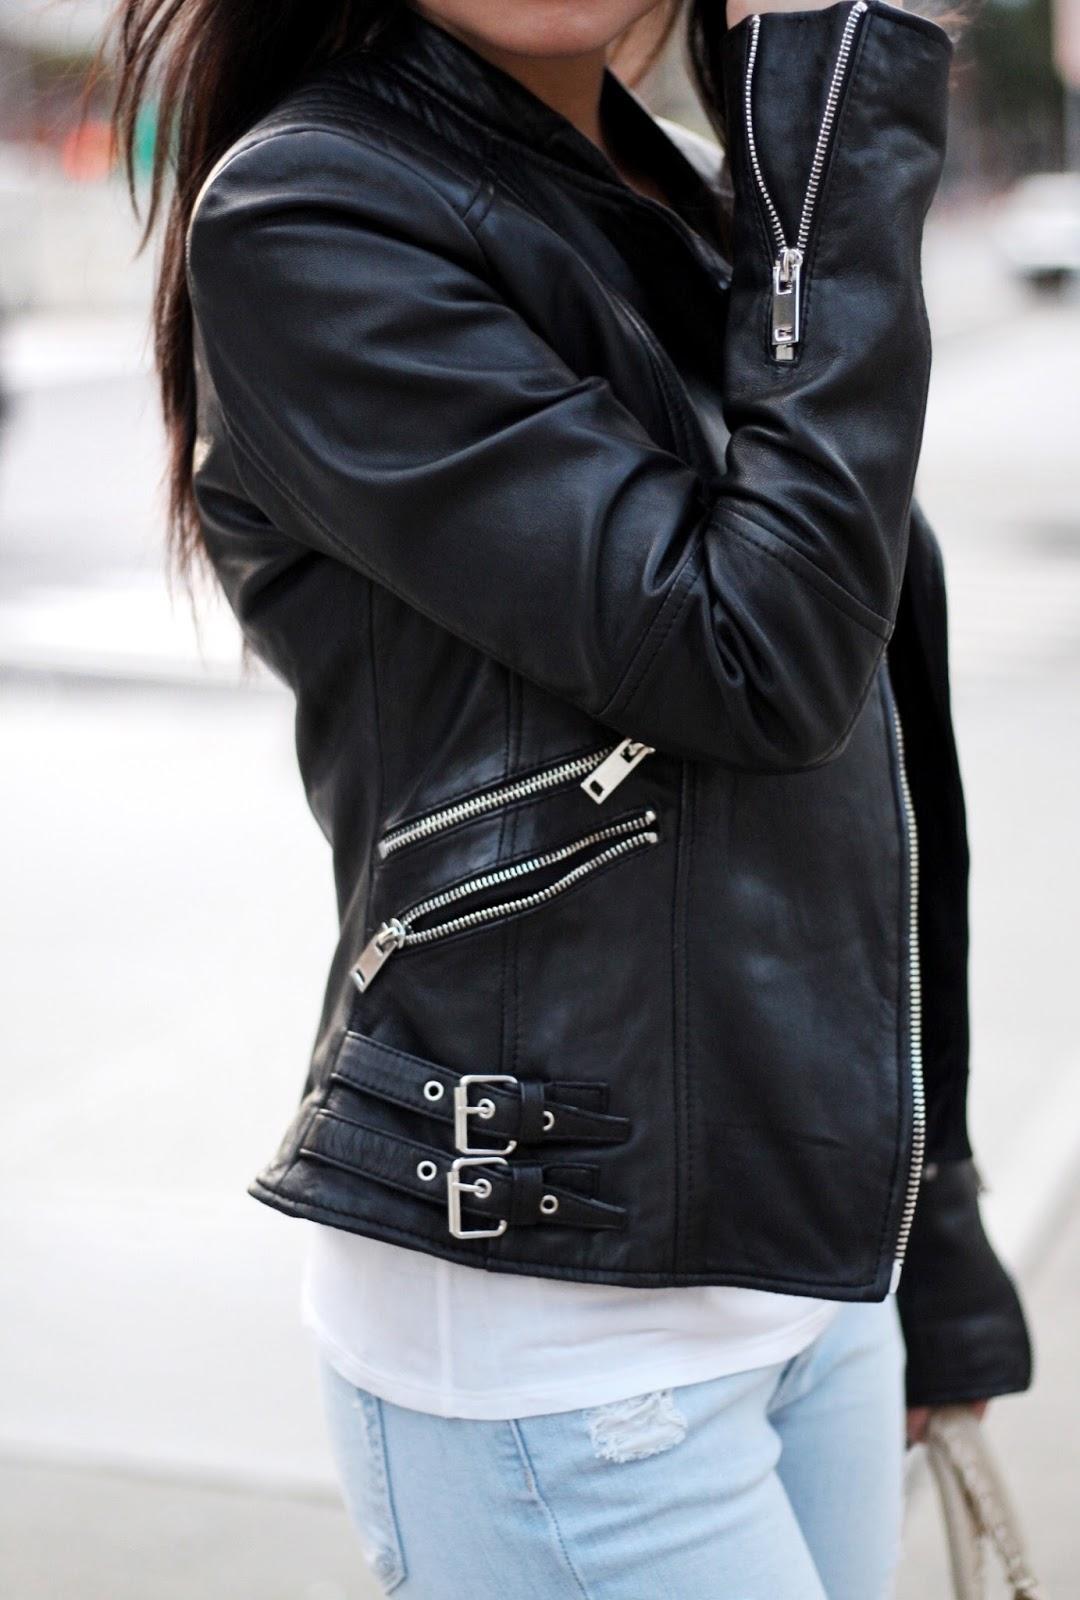 Leather jacket AG white tee Paige denim Tibi Denni loafer Balenciaga city bag